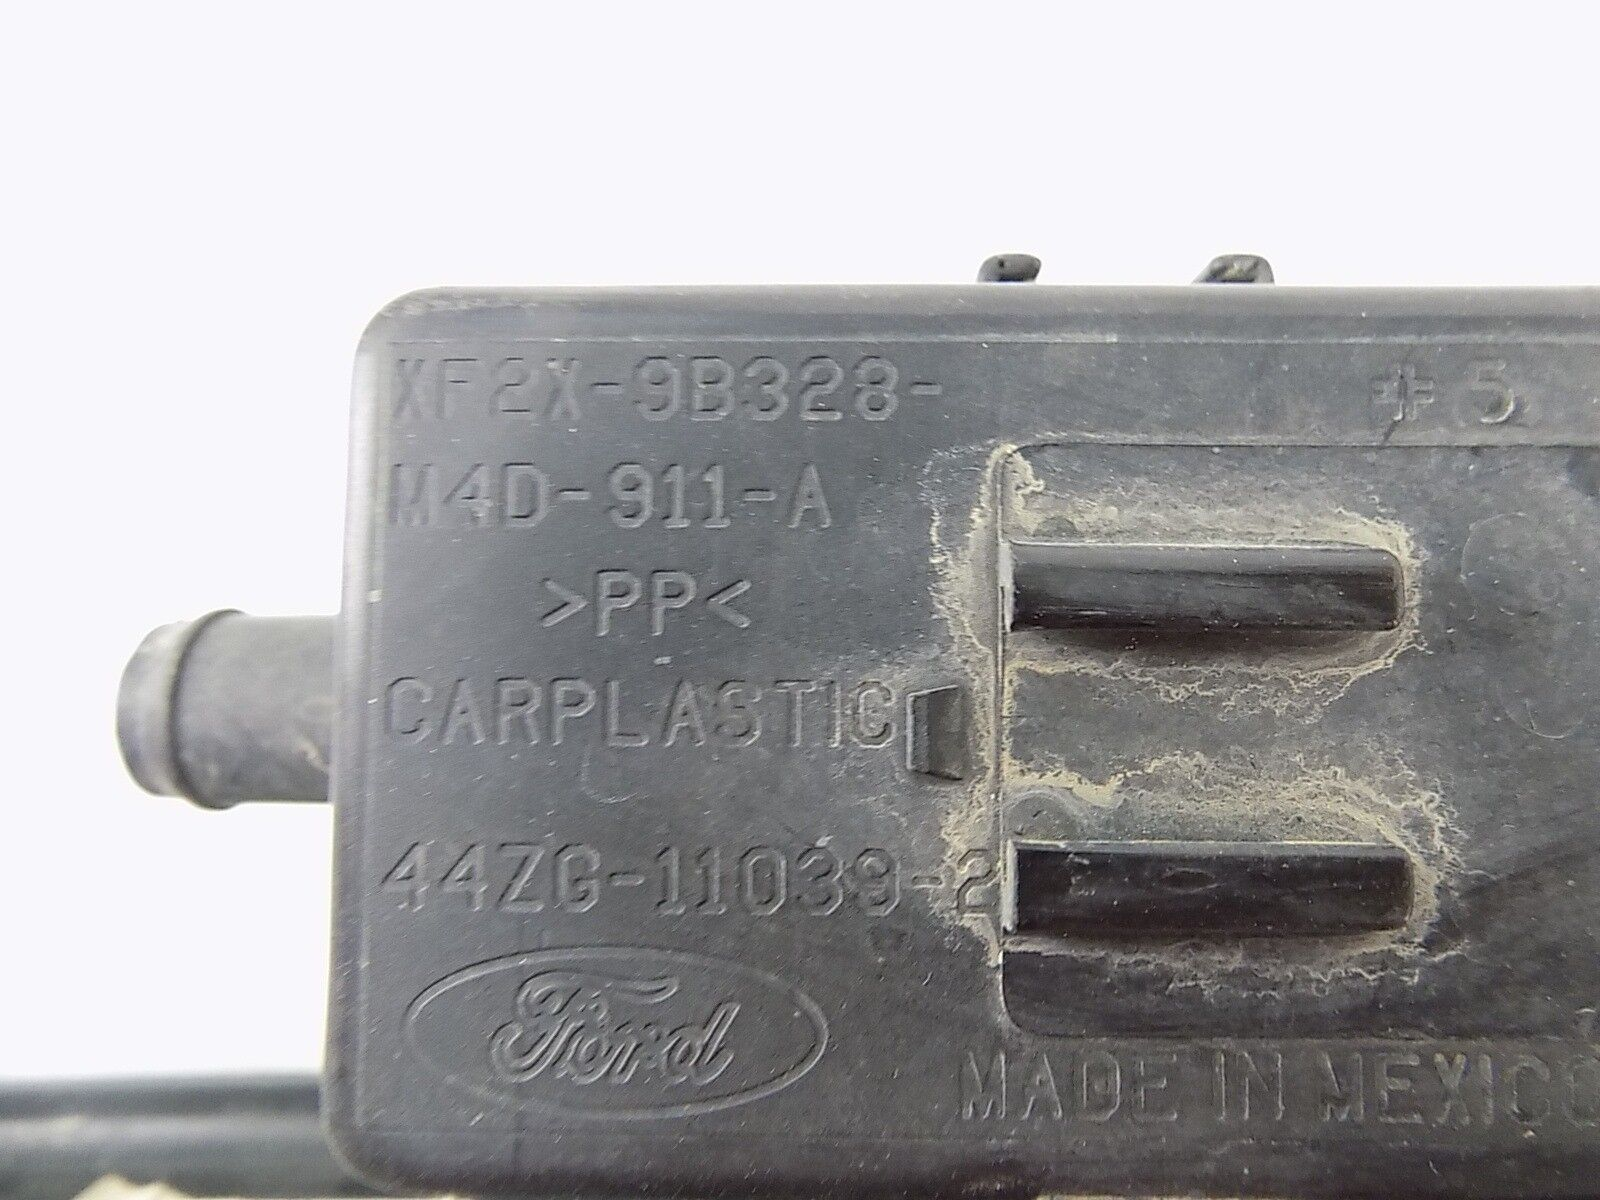 Used Jaguar S Type Fuel Filters For Sale Filter Vapor Charcoal Canister 2r8u9e857ad 42l 2003